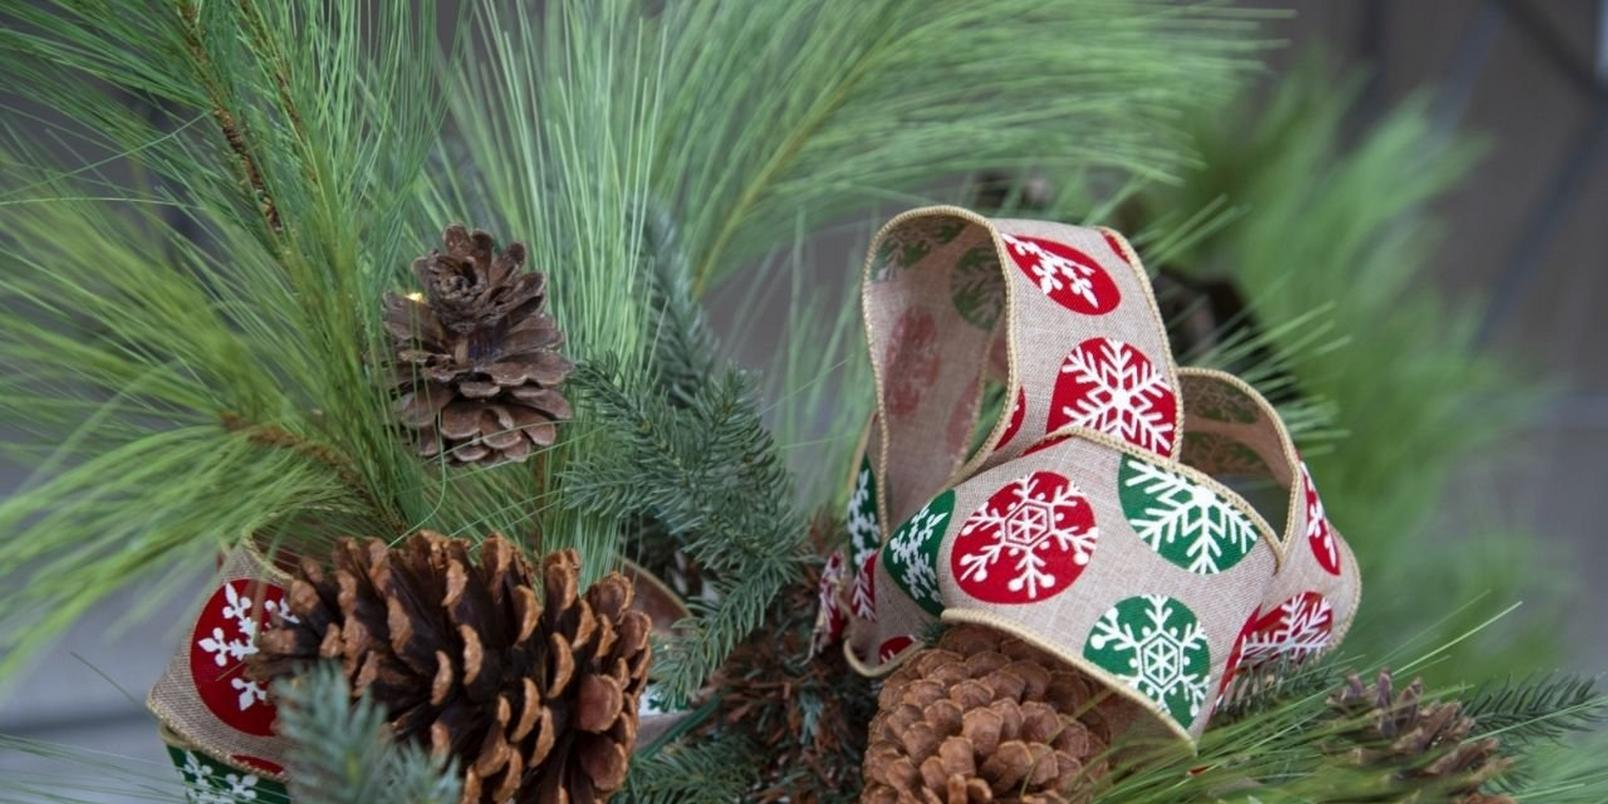 diy-christmas-tree-decorations-8